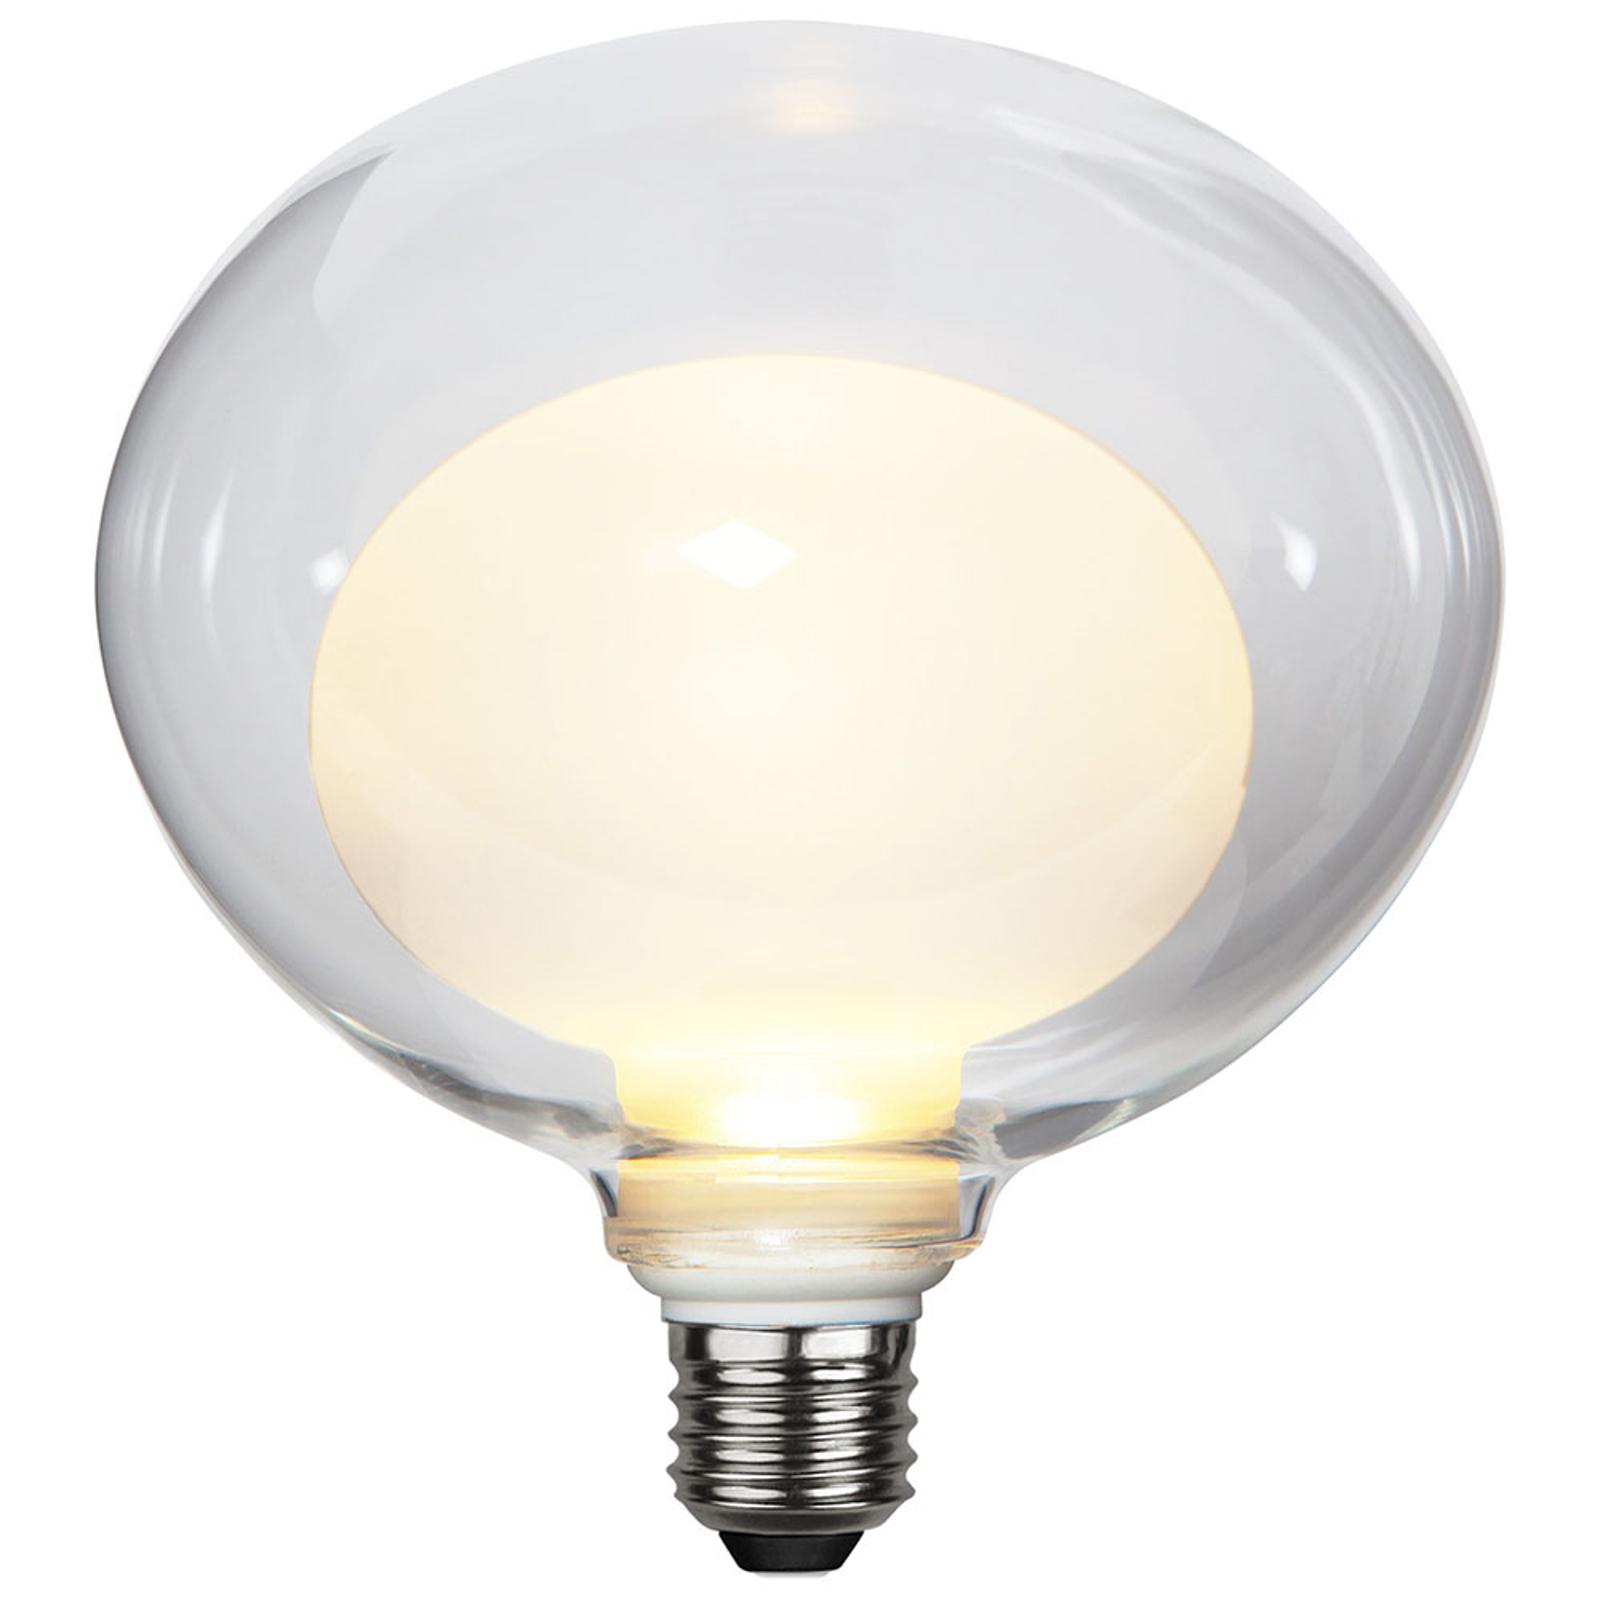 LED-Lampe Space E27 3,5W G150, opal, 3-step dim